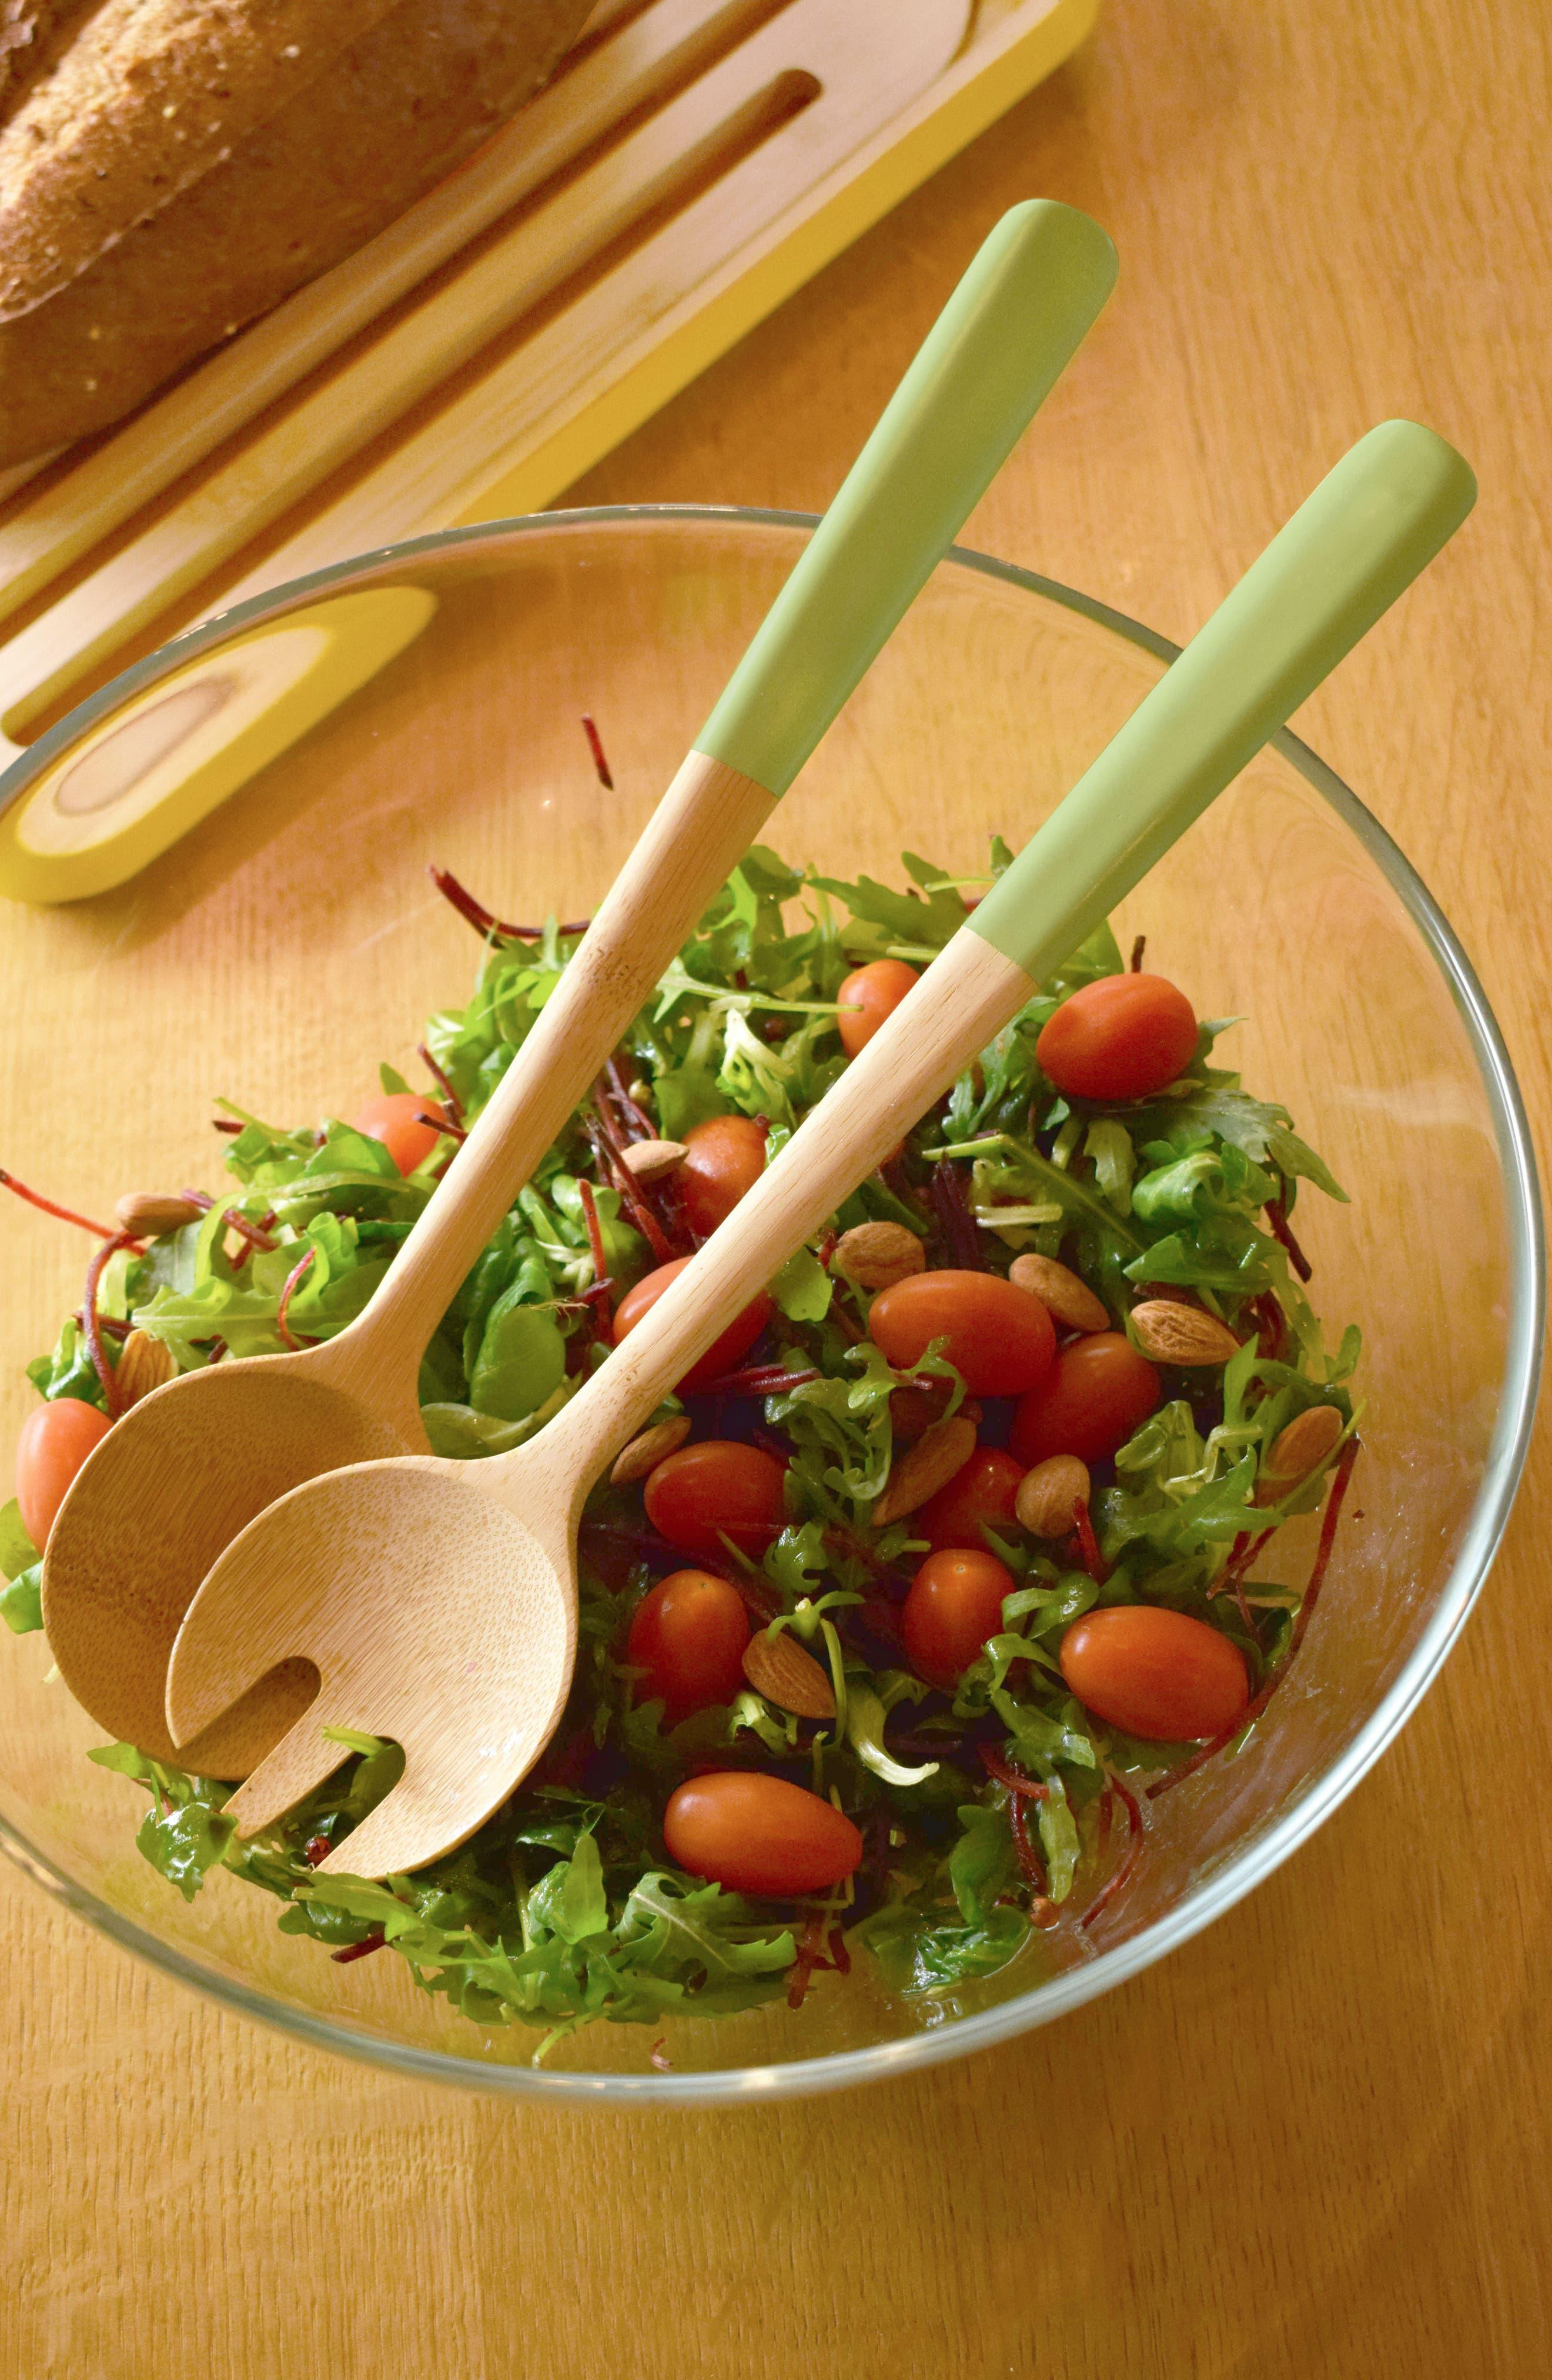 Bamboo Salad Servers,                             Alternate thumbnail 2, color,                             Pistachio Green